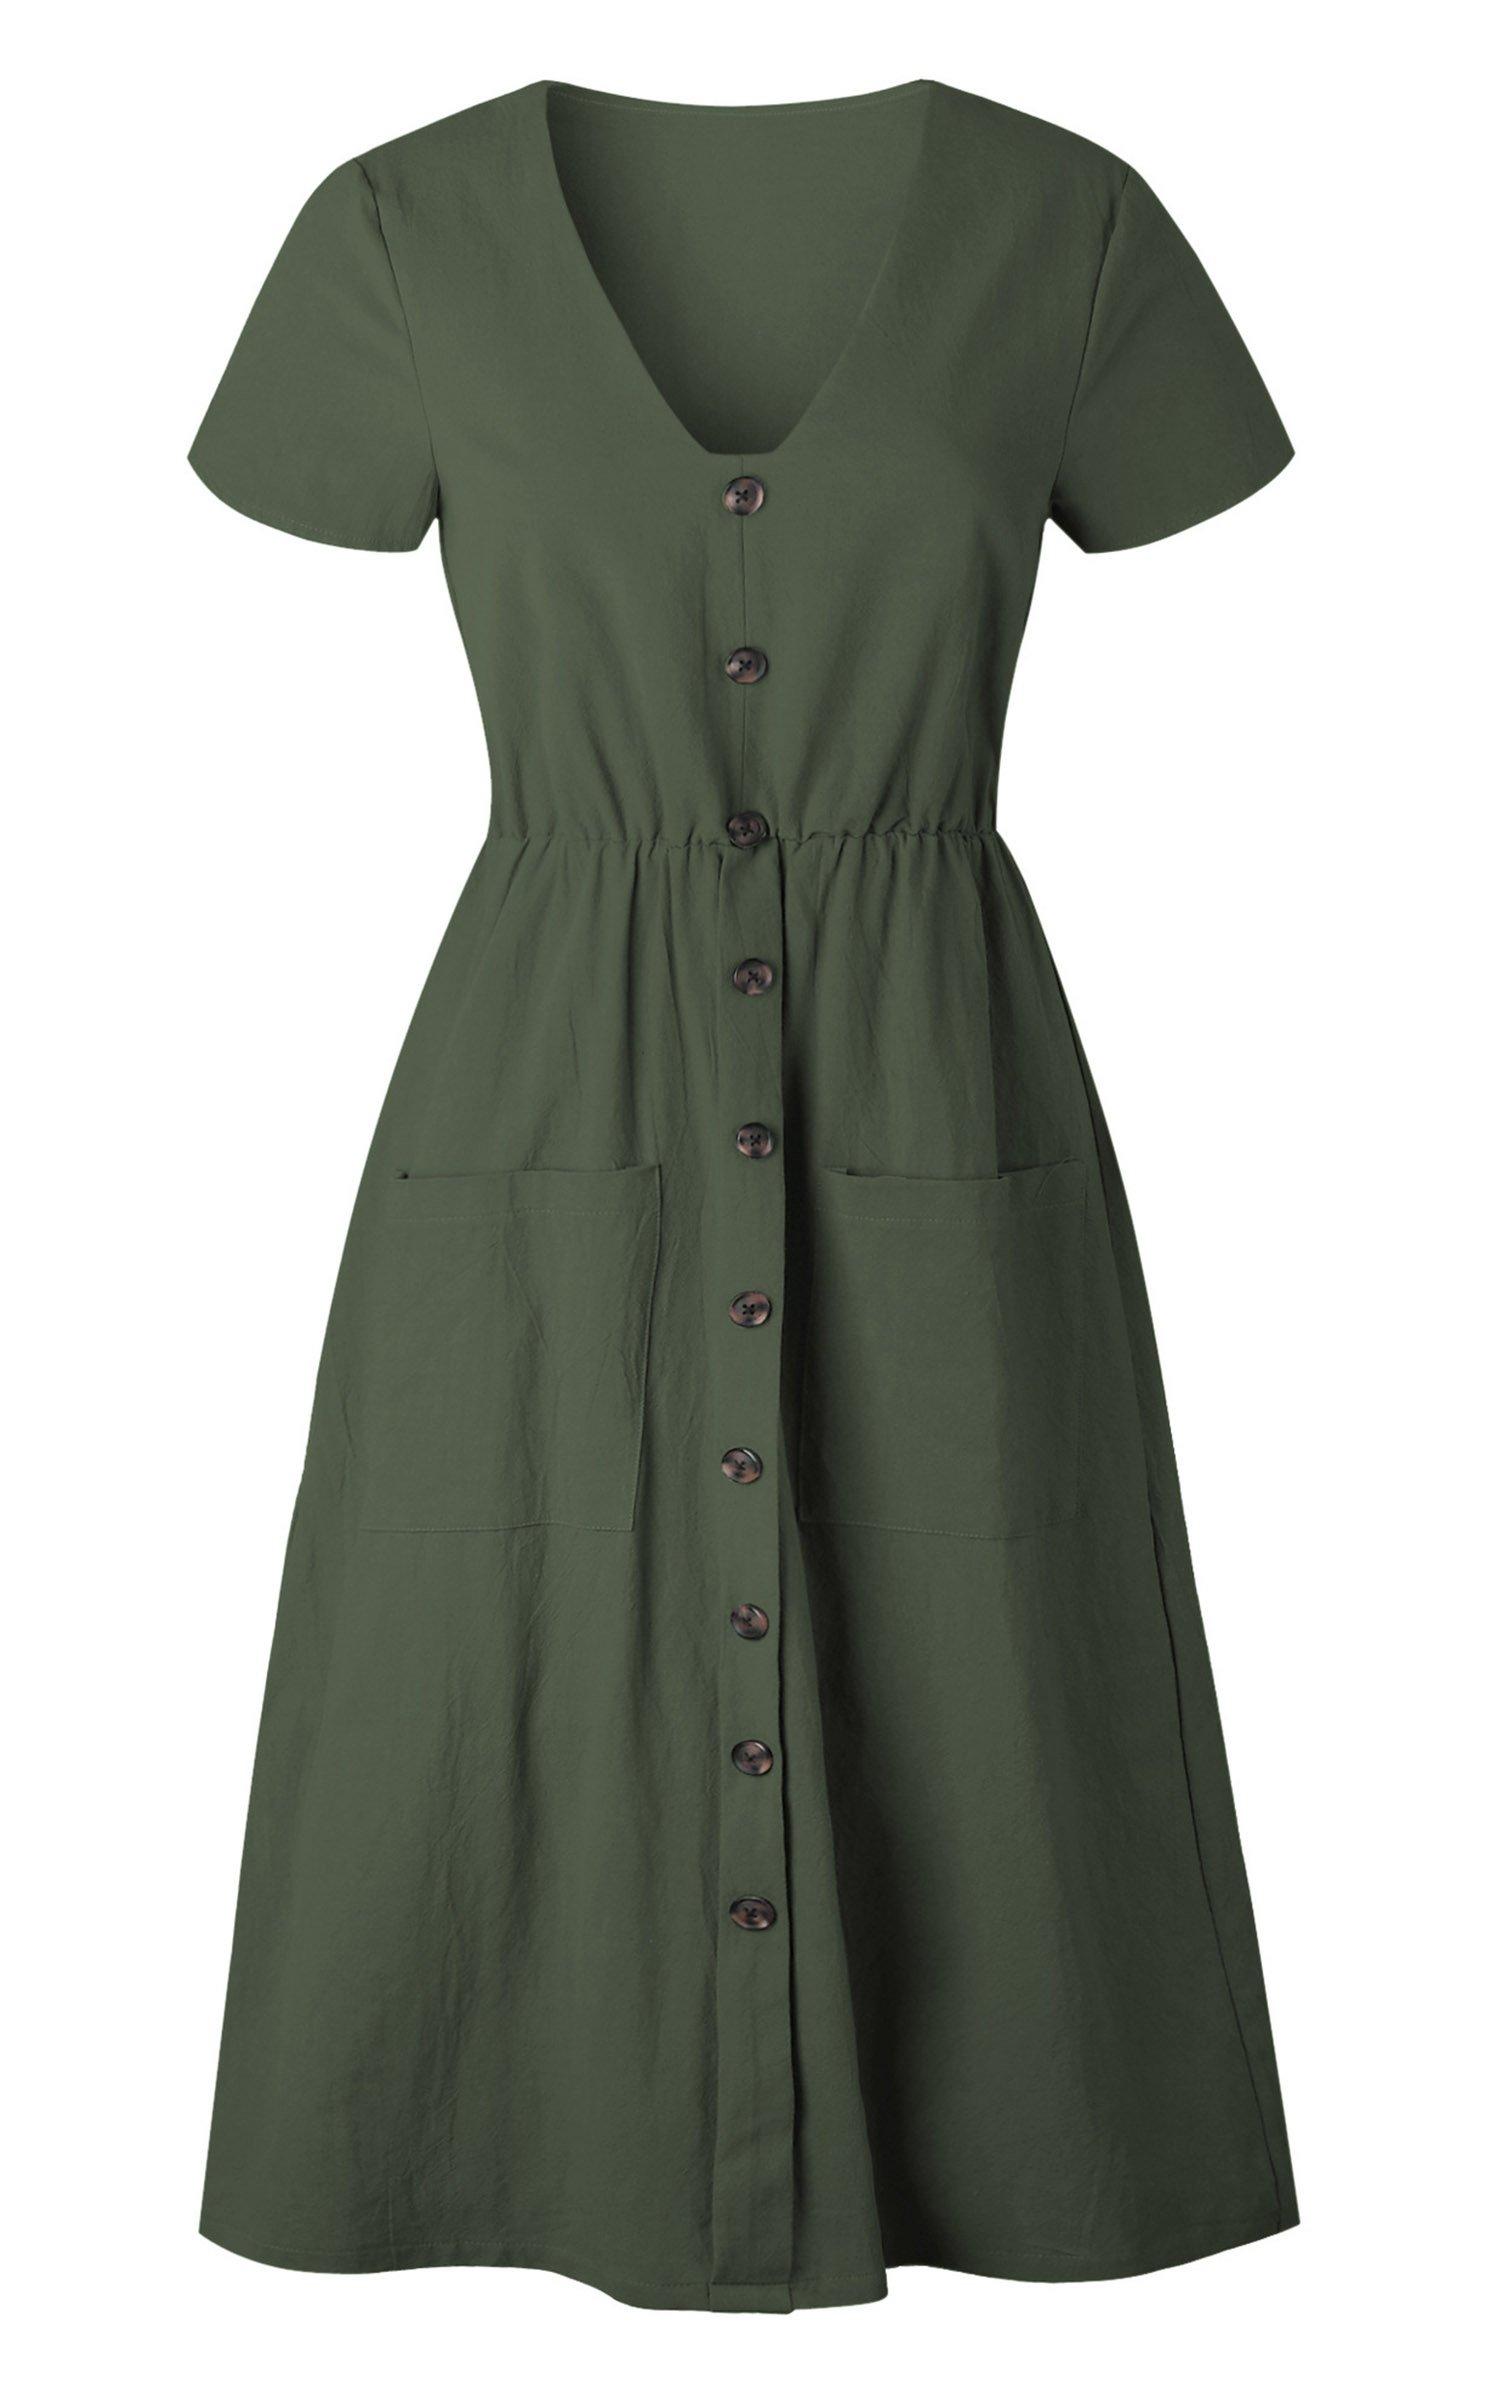 Angashion Women's Dresses-Short Sleeve V Neck Button T Shirt Midi Skater Dress with Pockets by Angashion (Image #5)